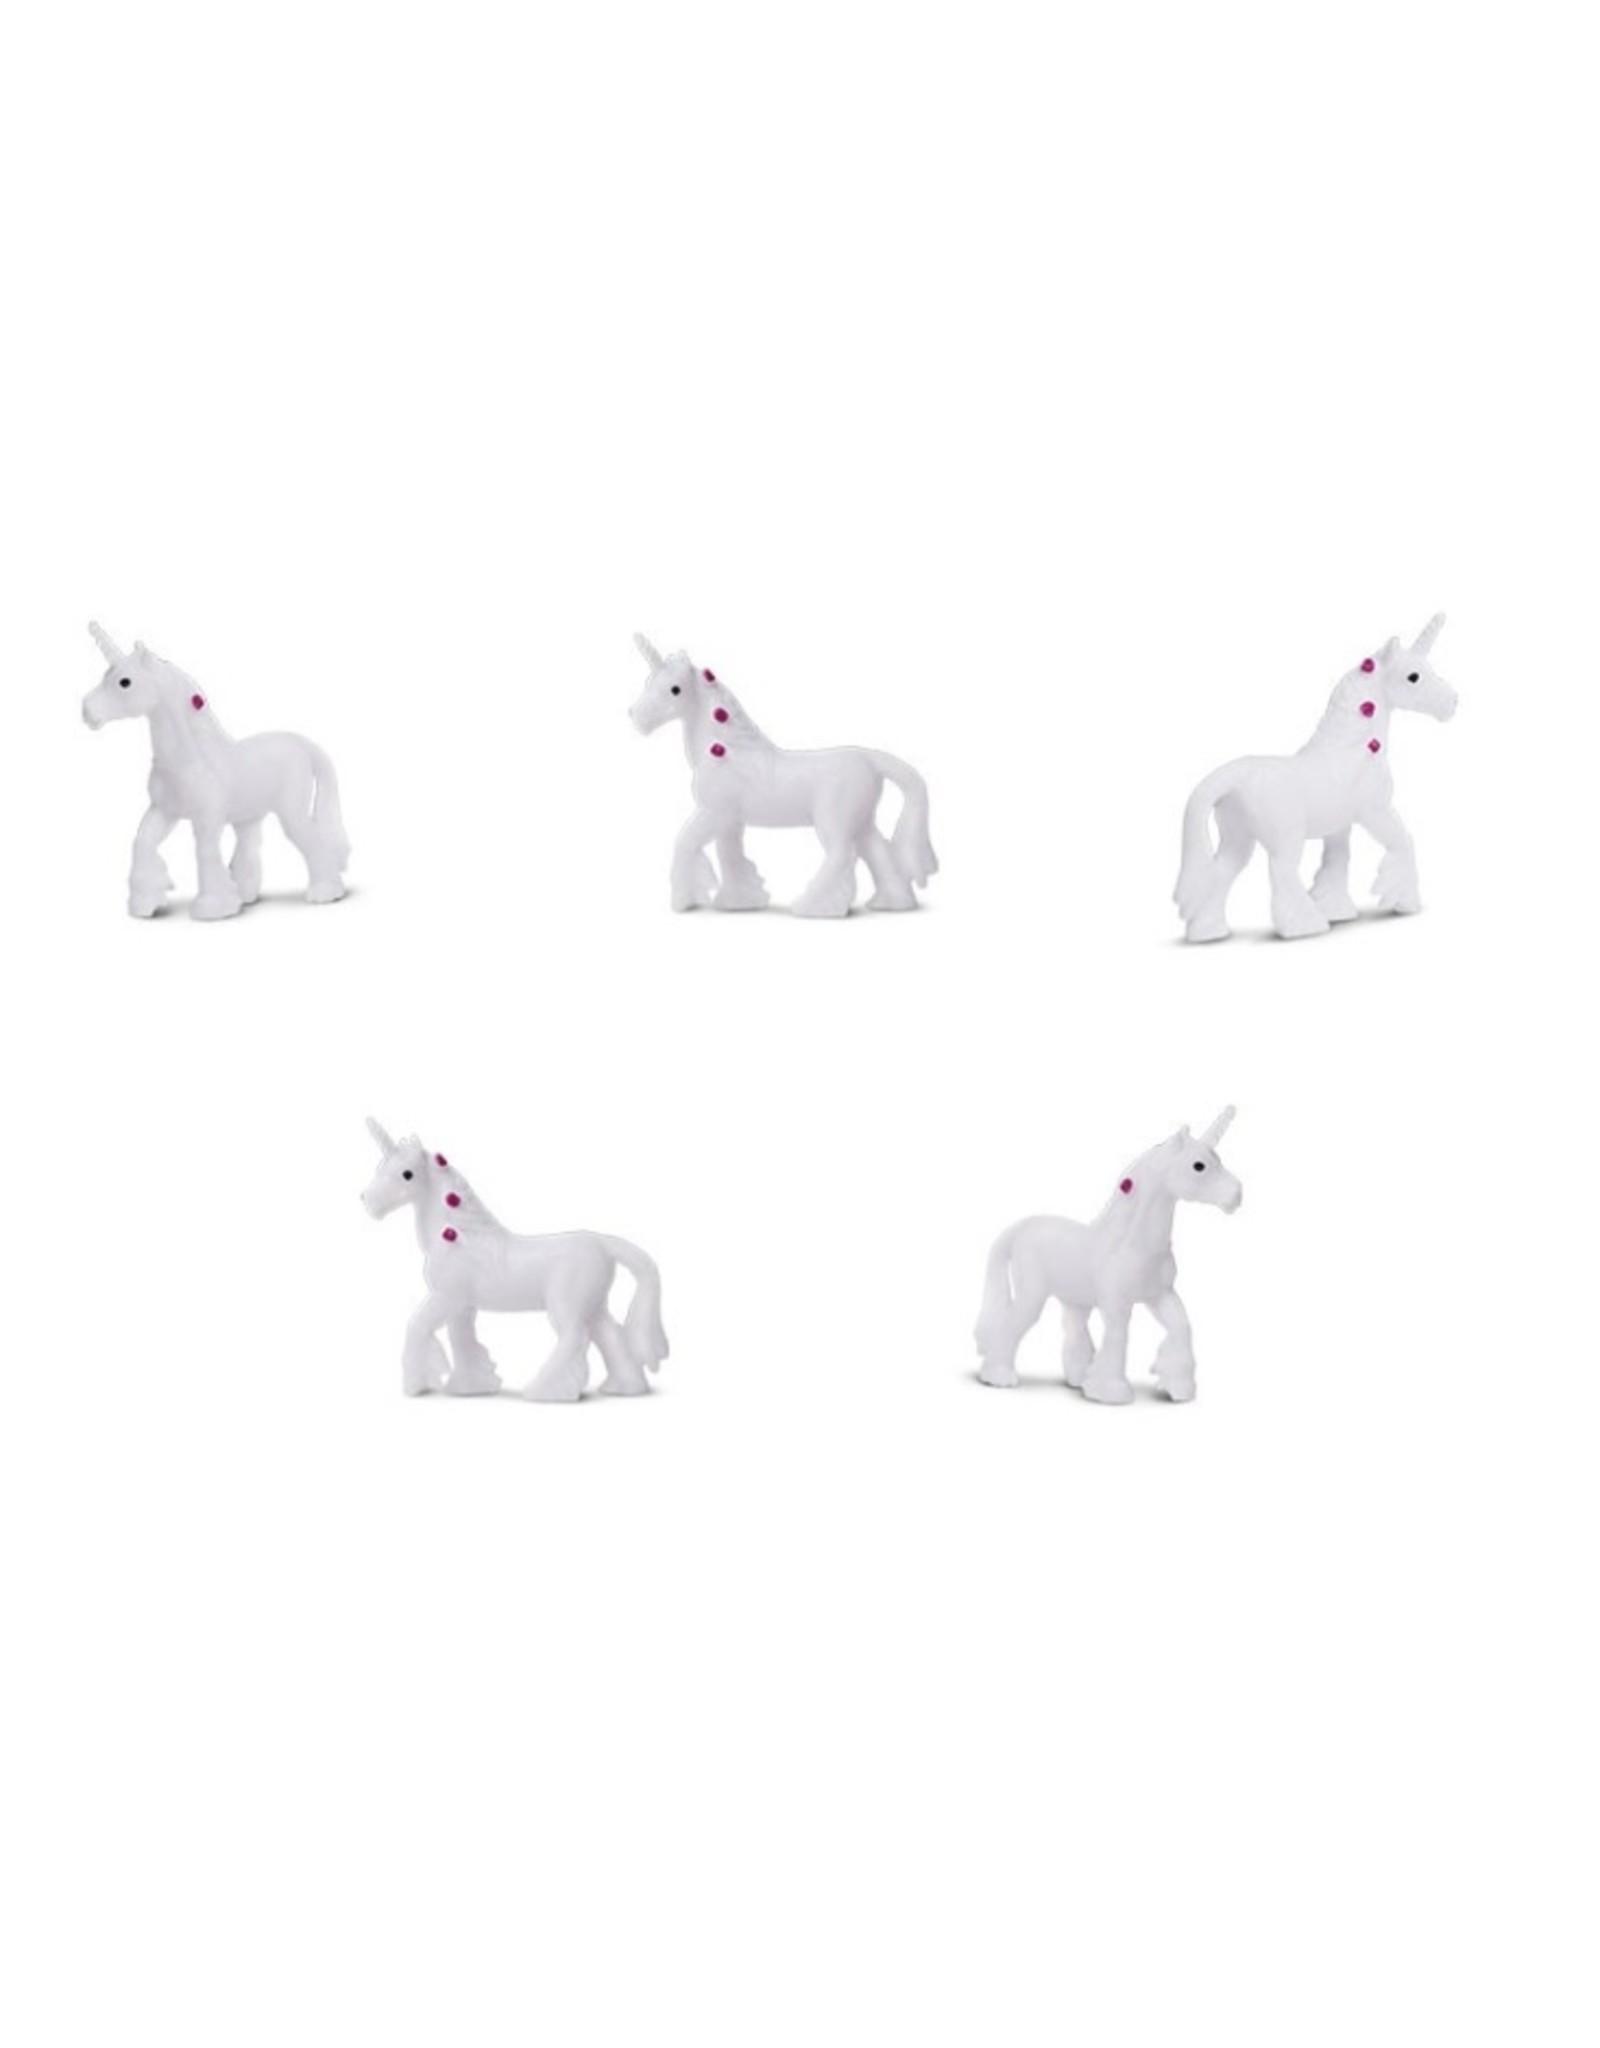 Goodluck mini - unicorn